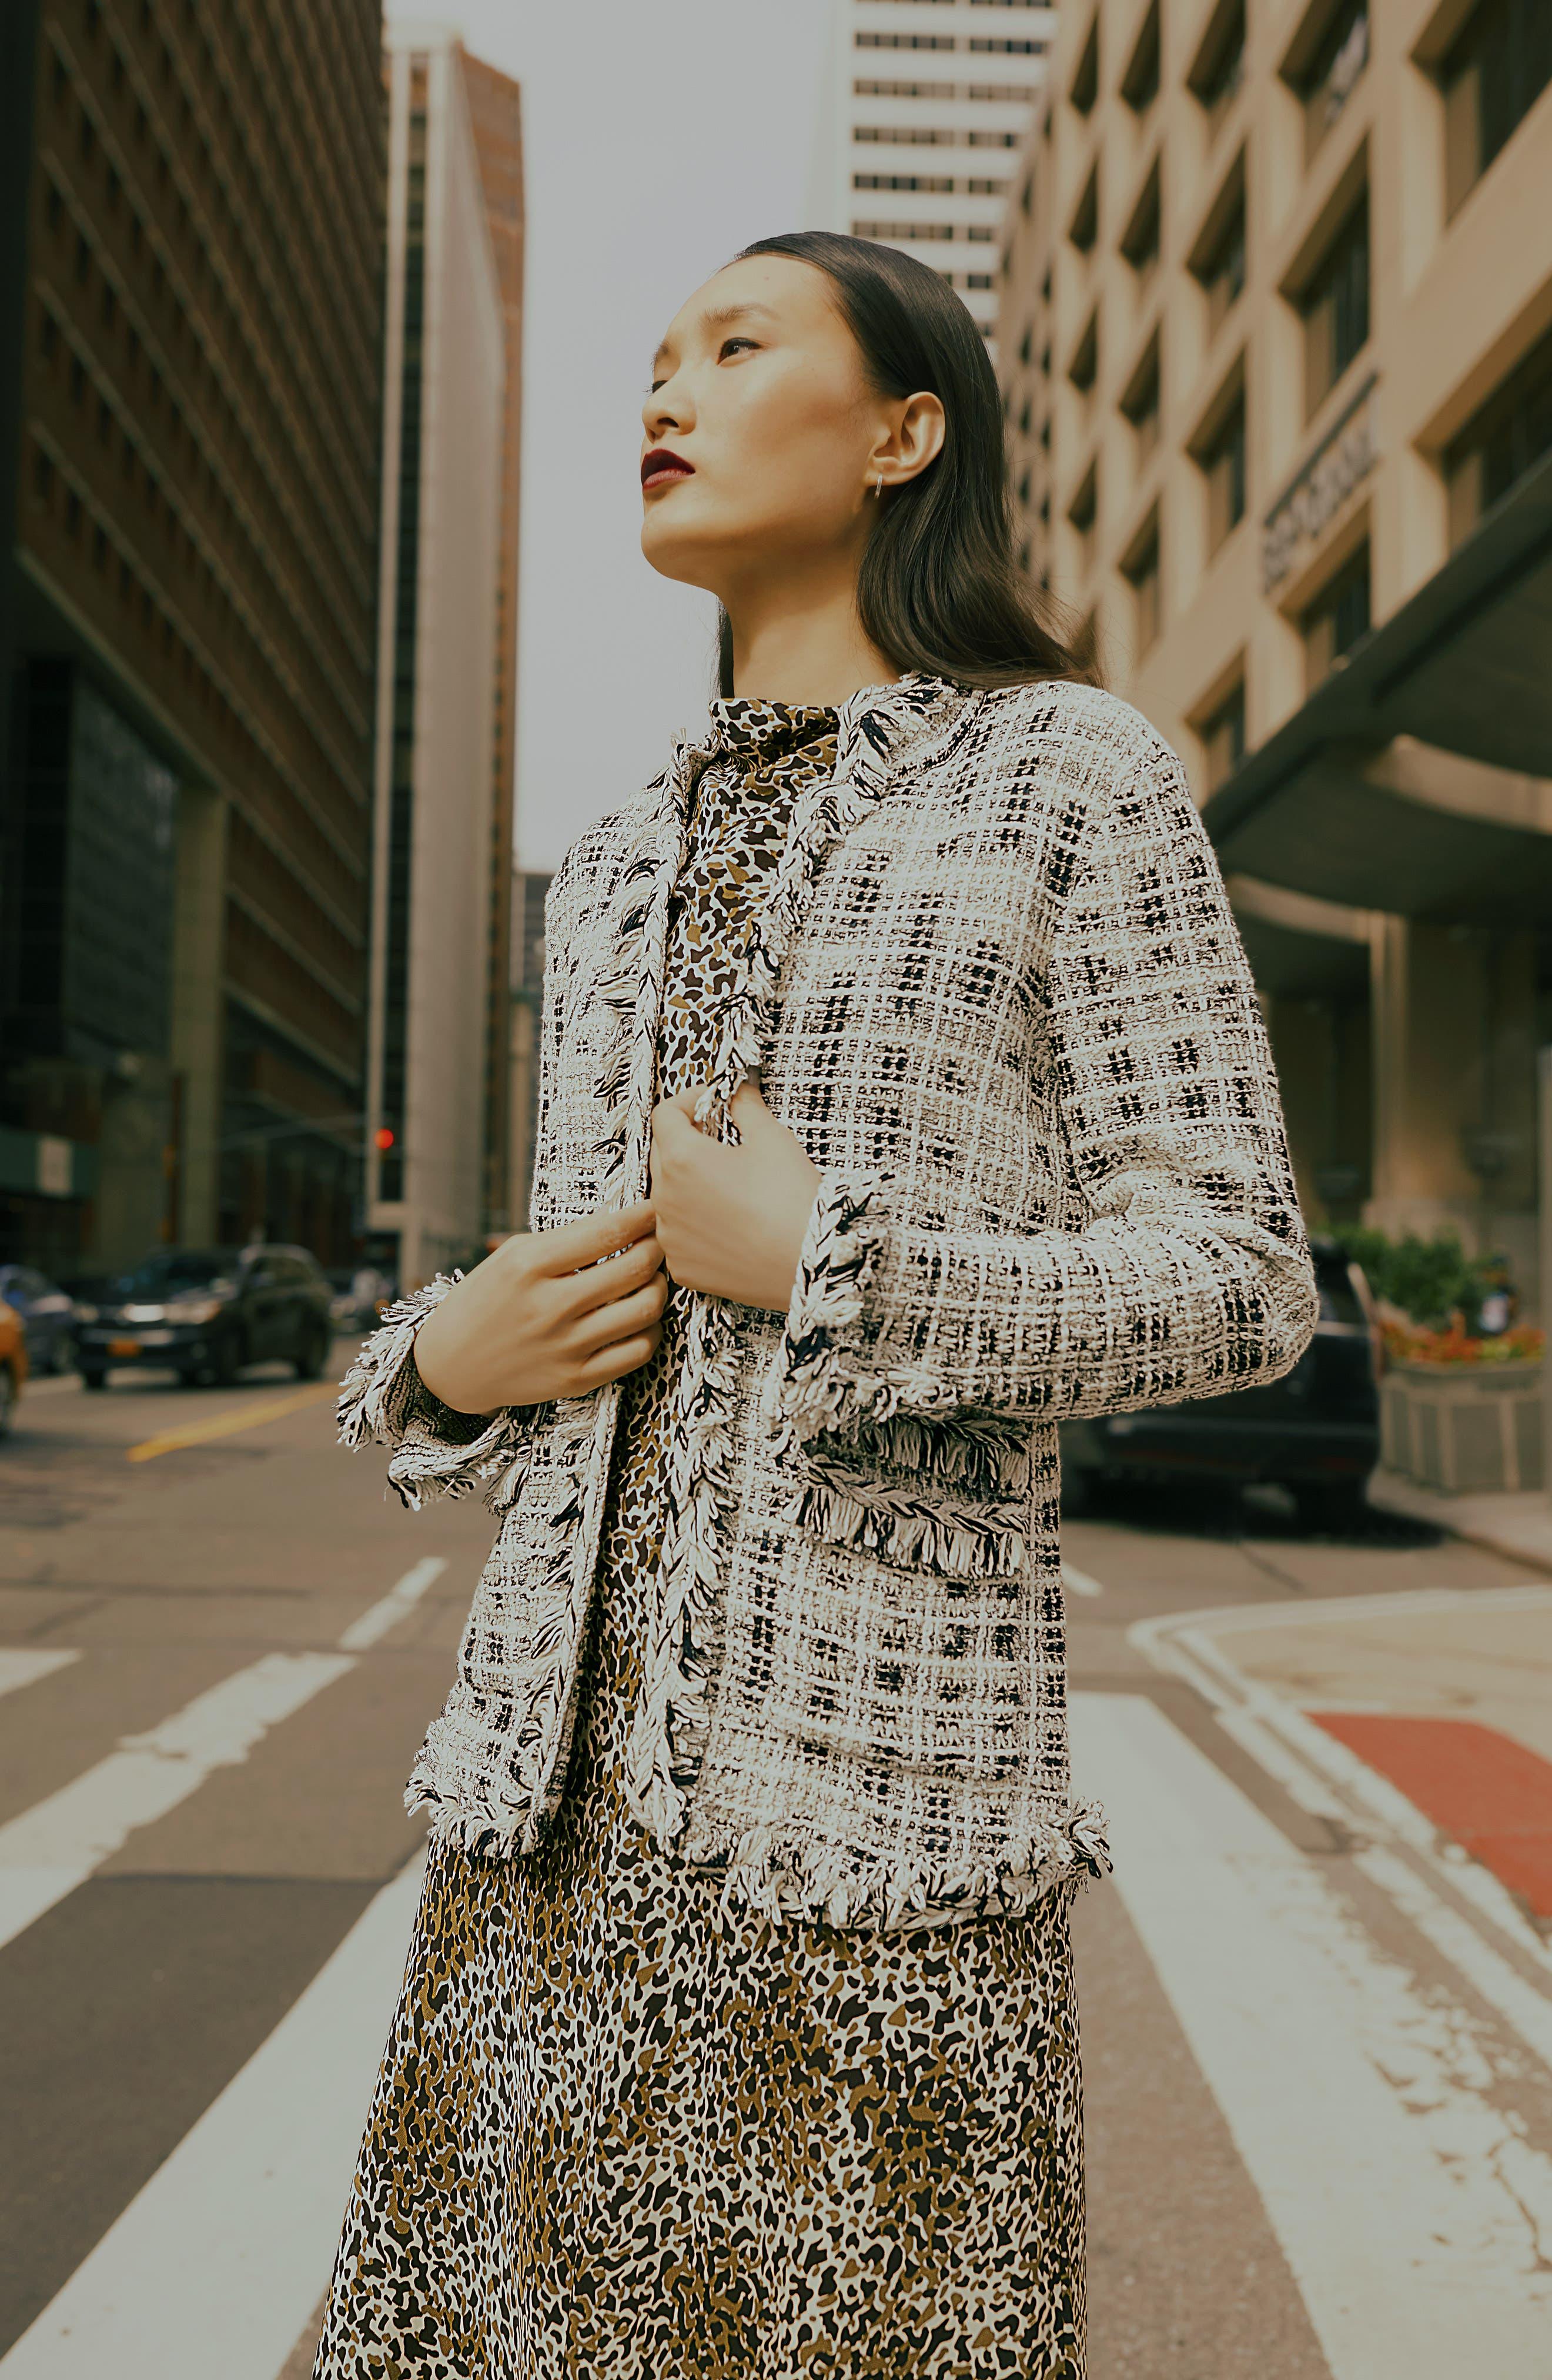 Nic+zoe Coats New Mix Jacket